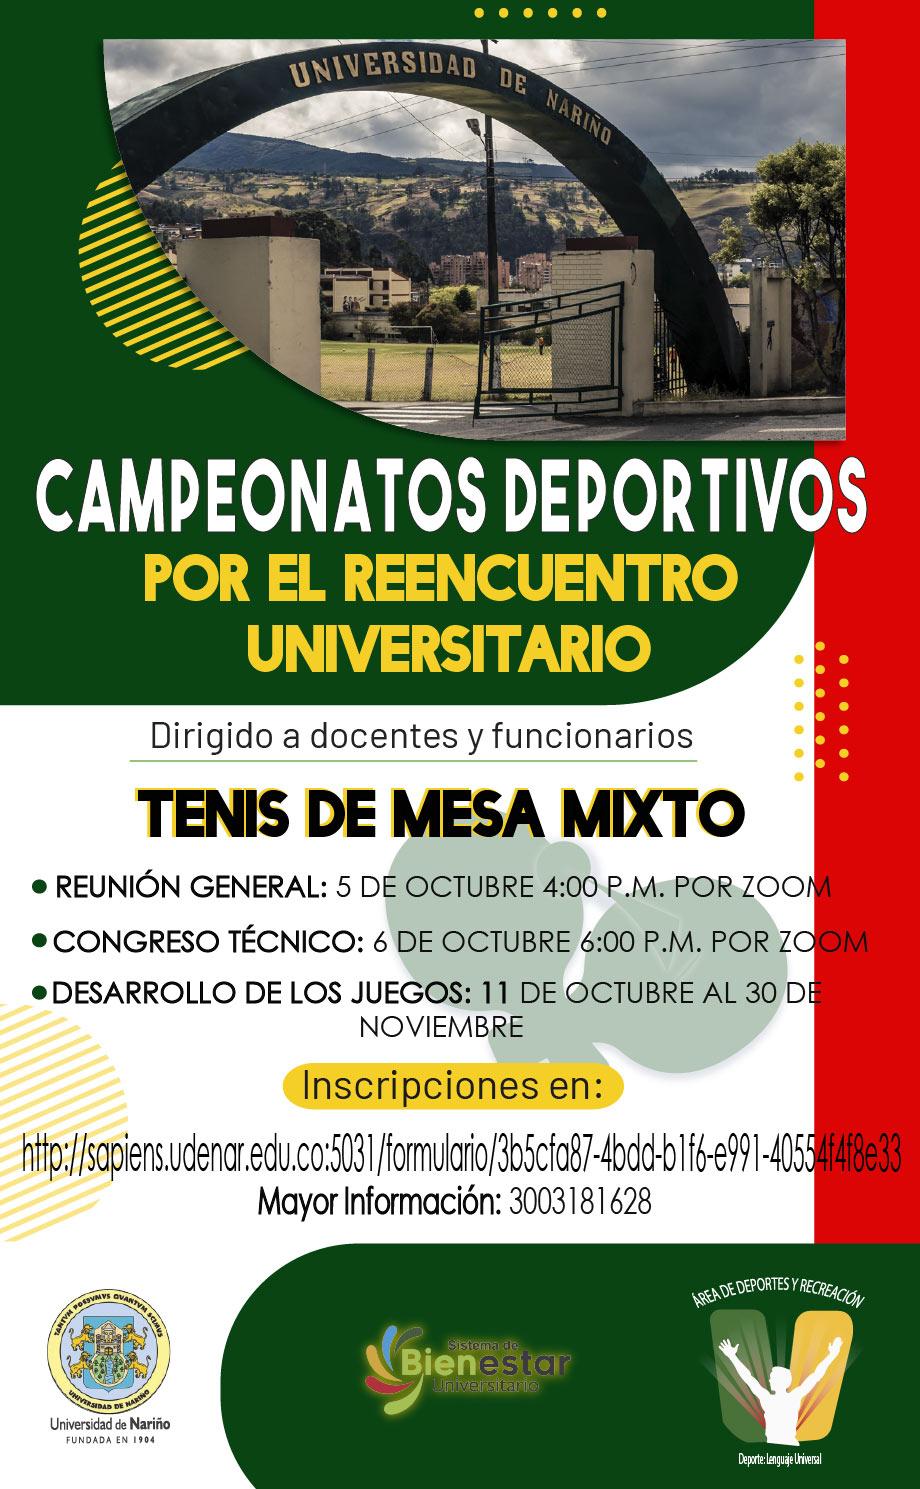 Reencuentro-Universitario-TenisMesa